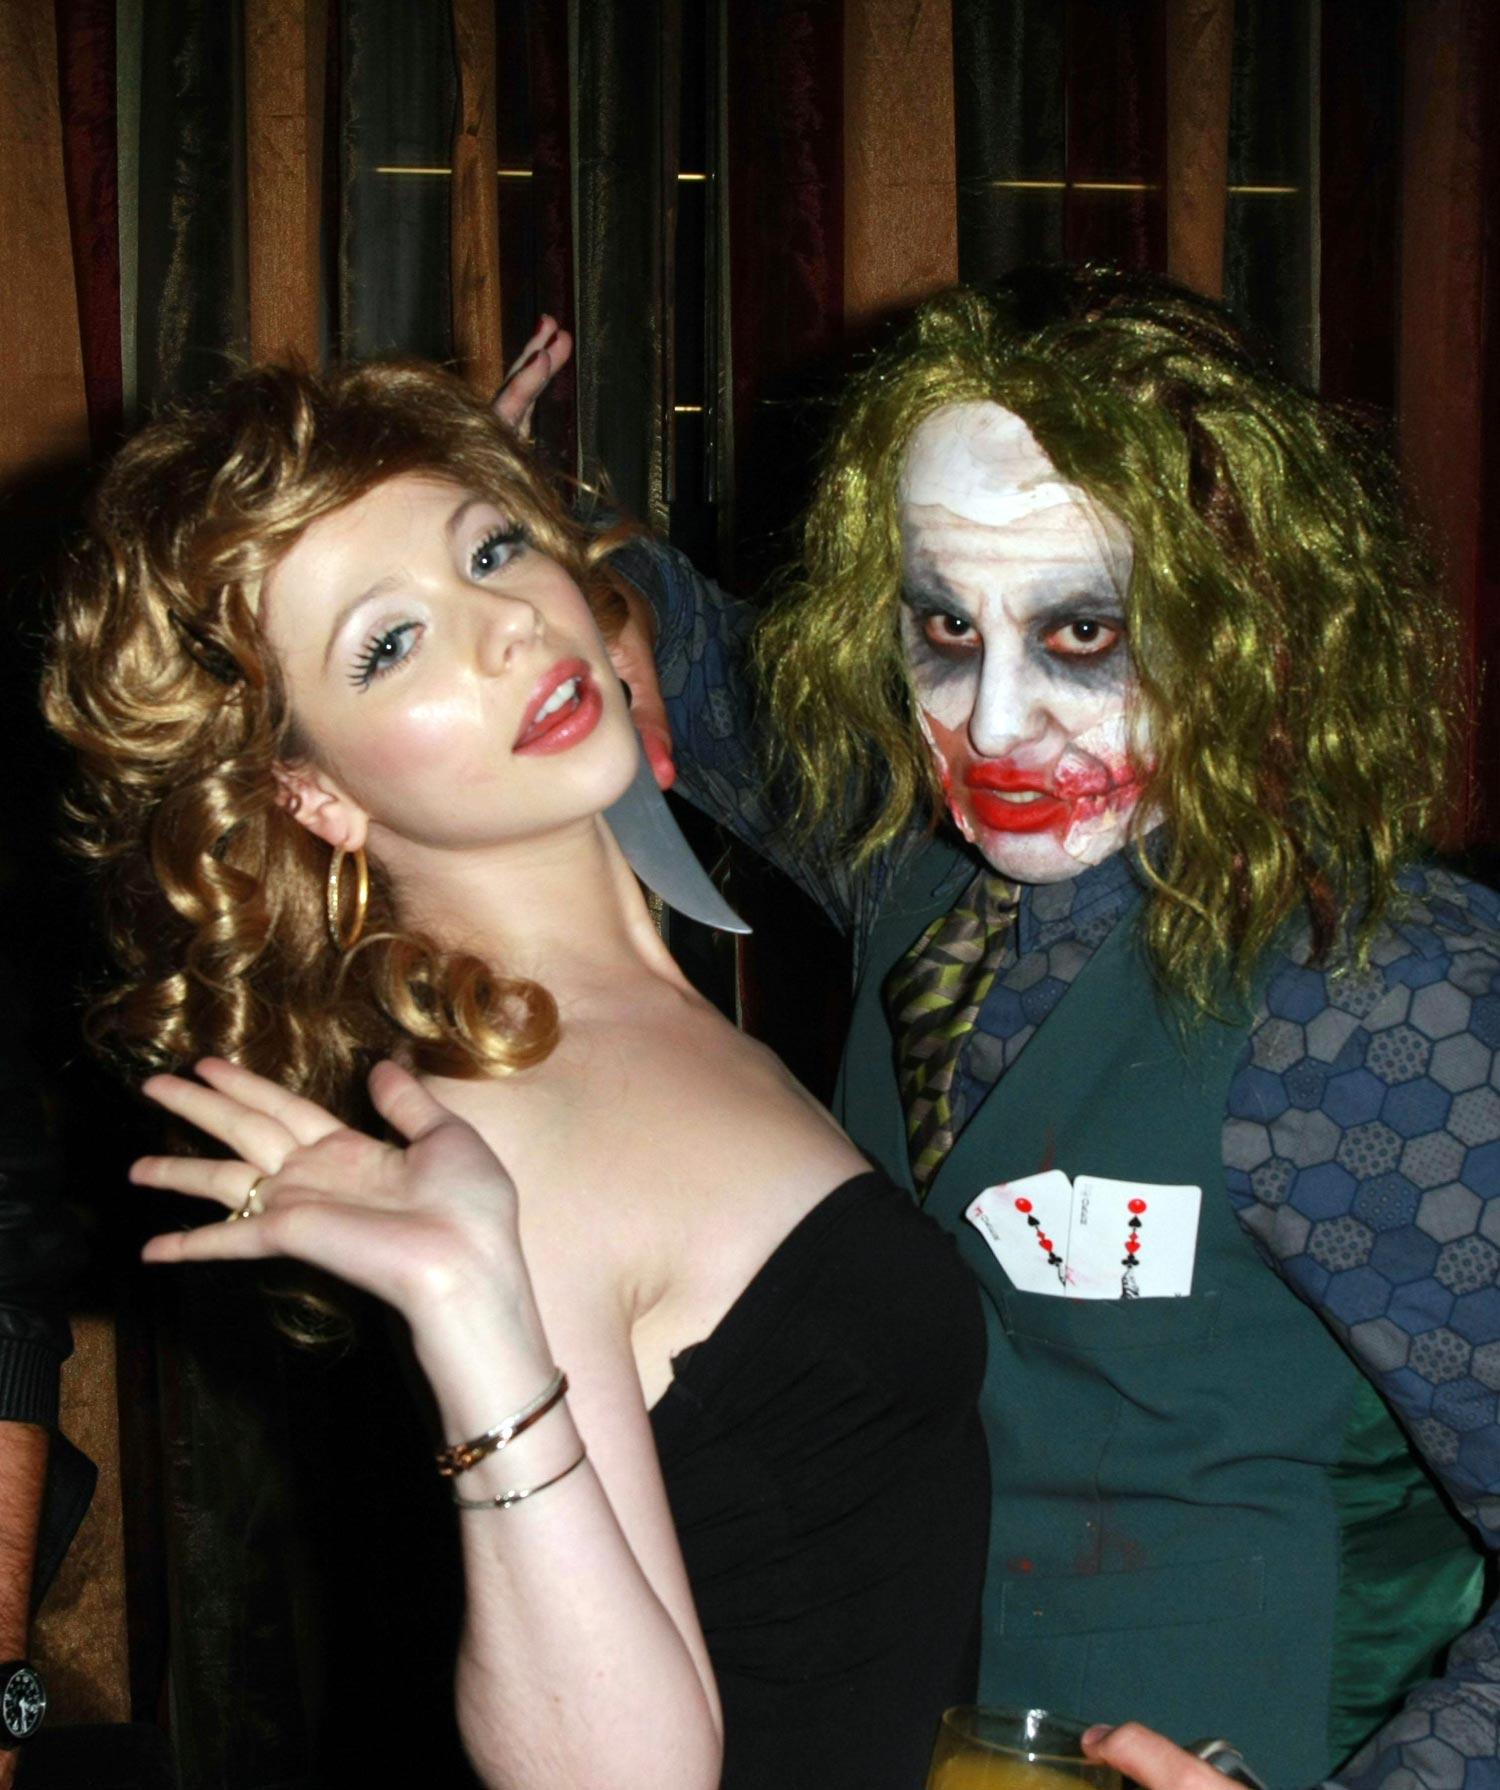 http://www.whedon.info/IMG/jpg/michelle-trachtenberg-2008-halloween-party-hq-01-1500.jpg